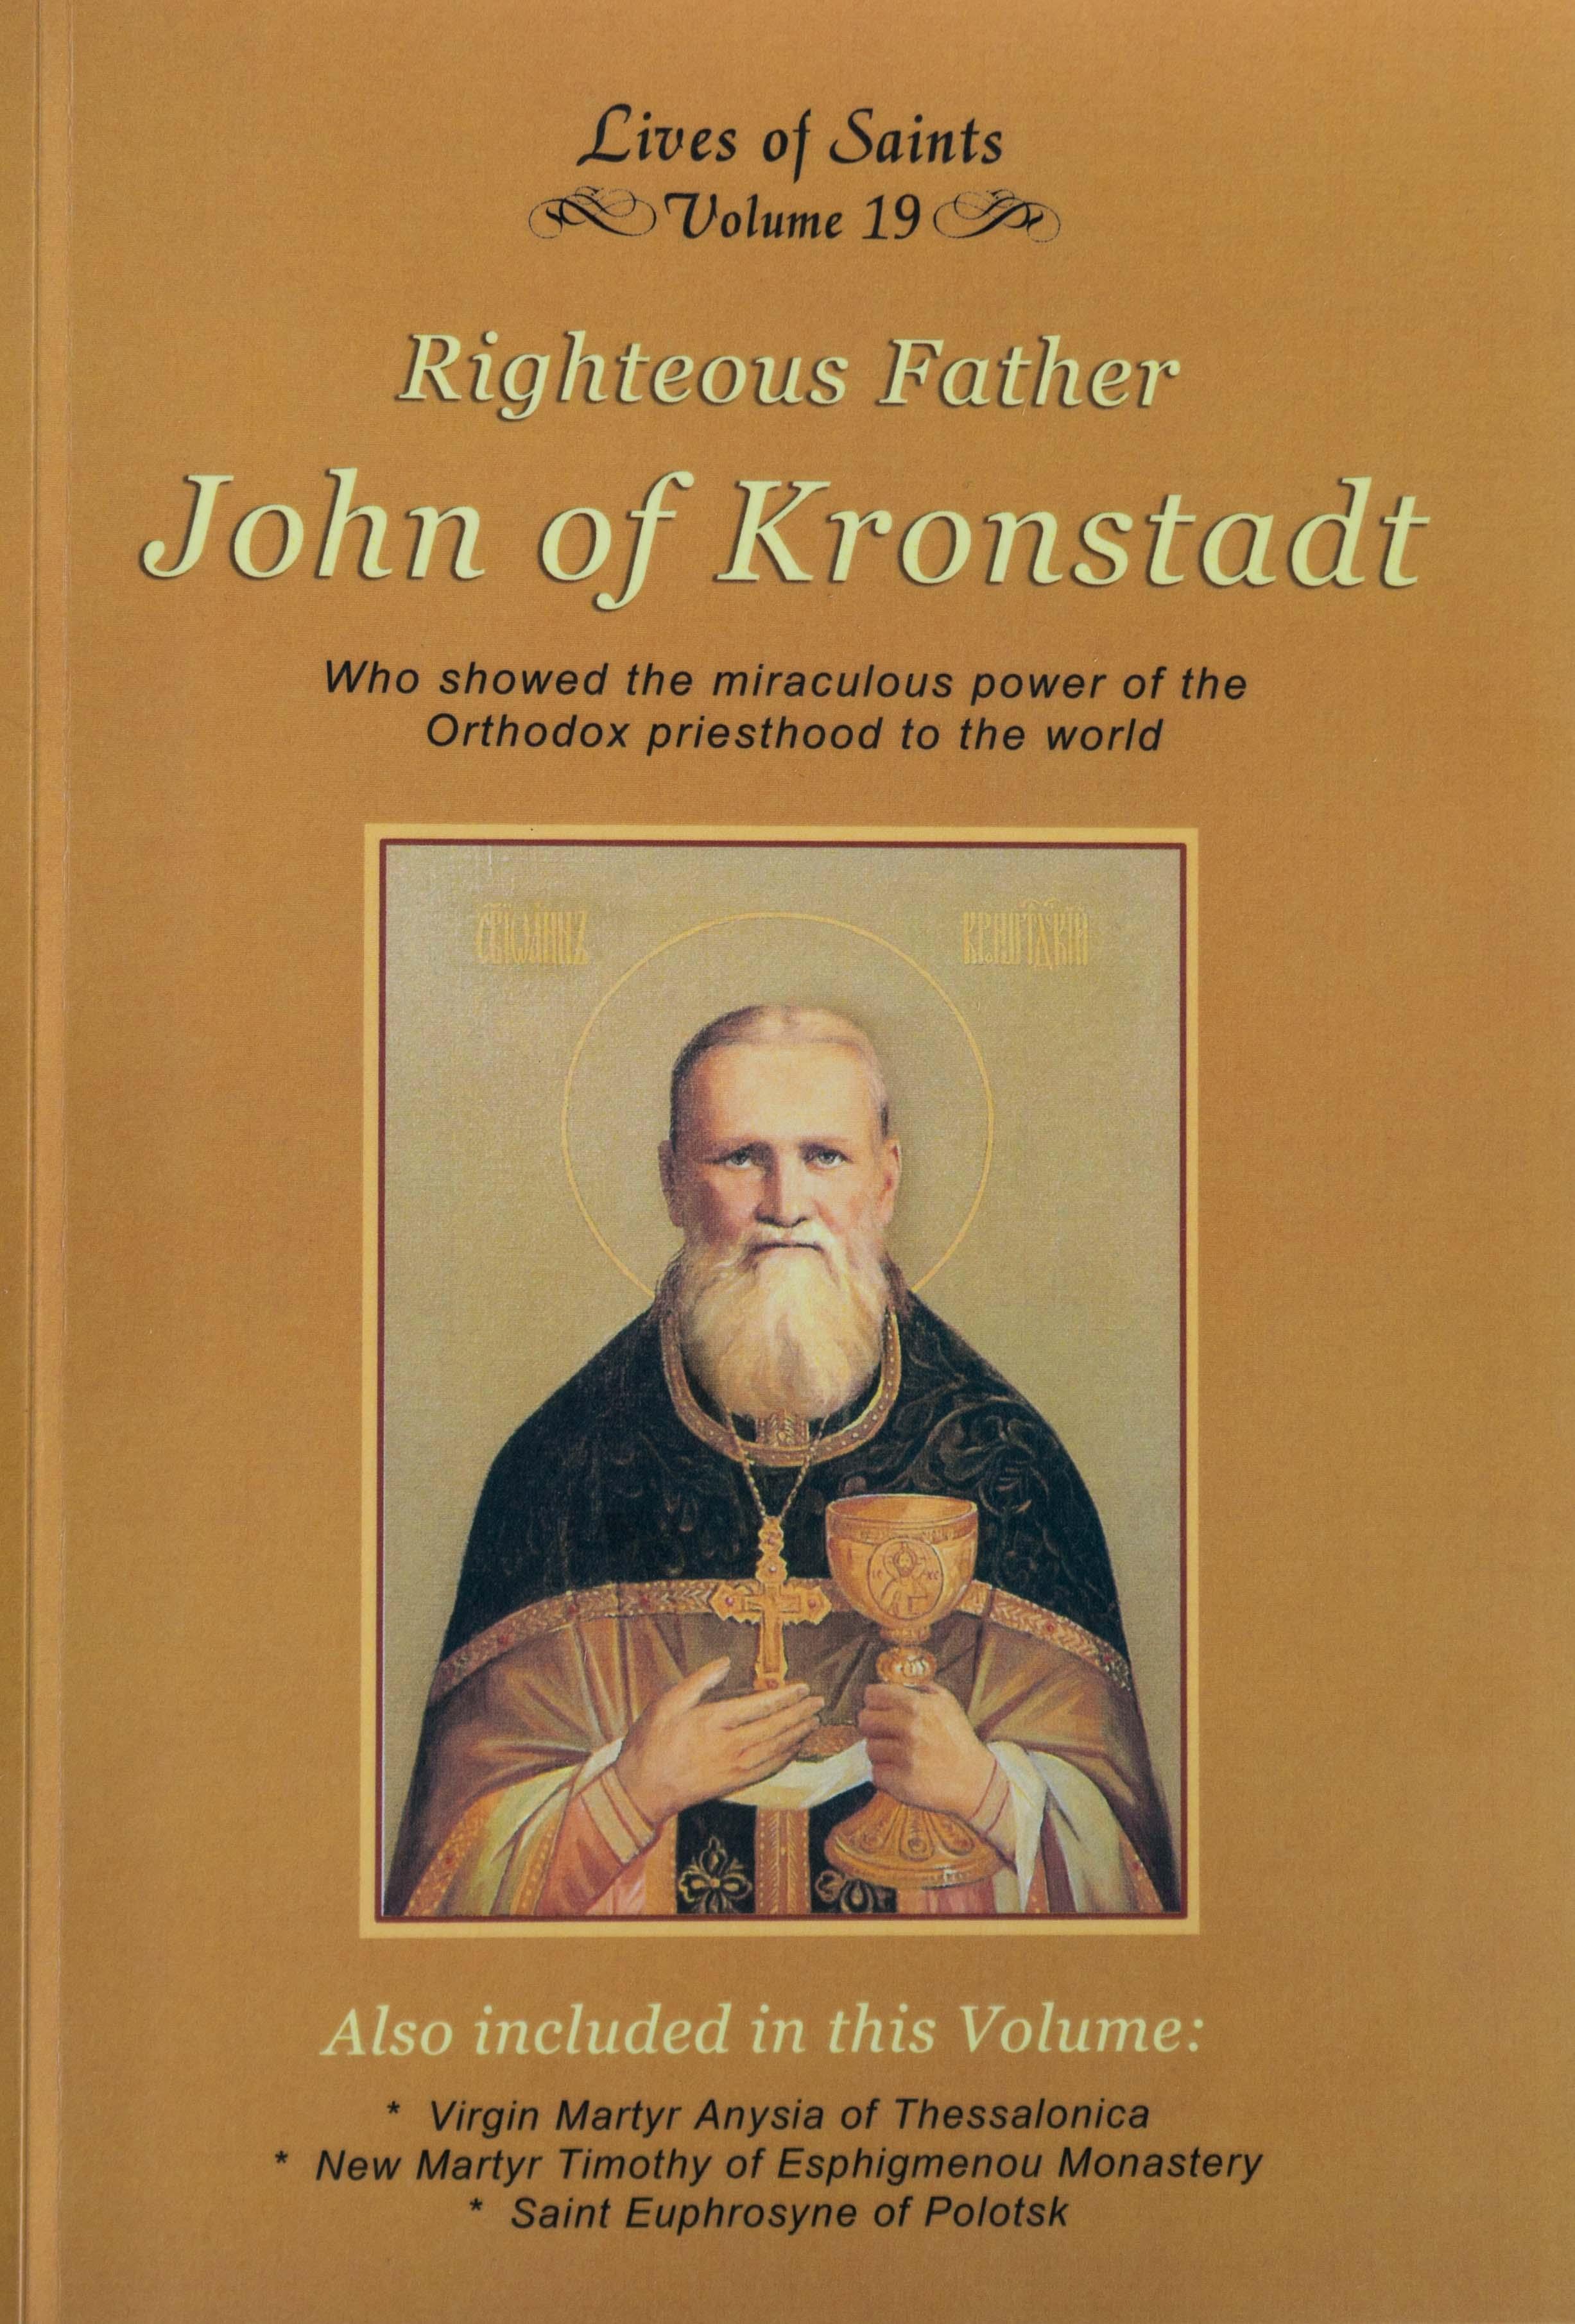 Lives of Saints Vol. 19: Righteous Father John of Kronstadt